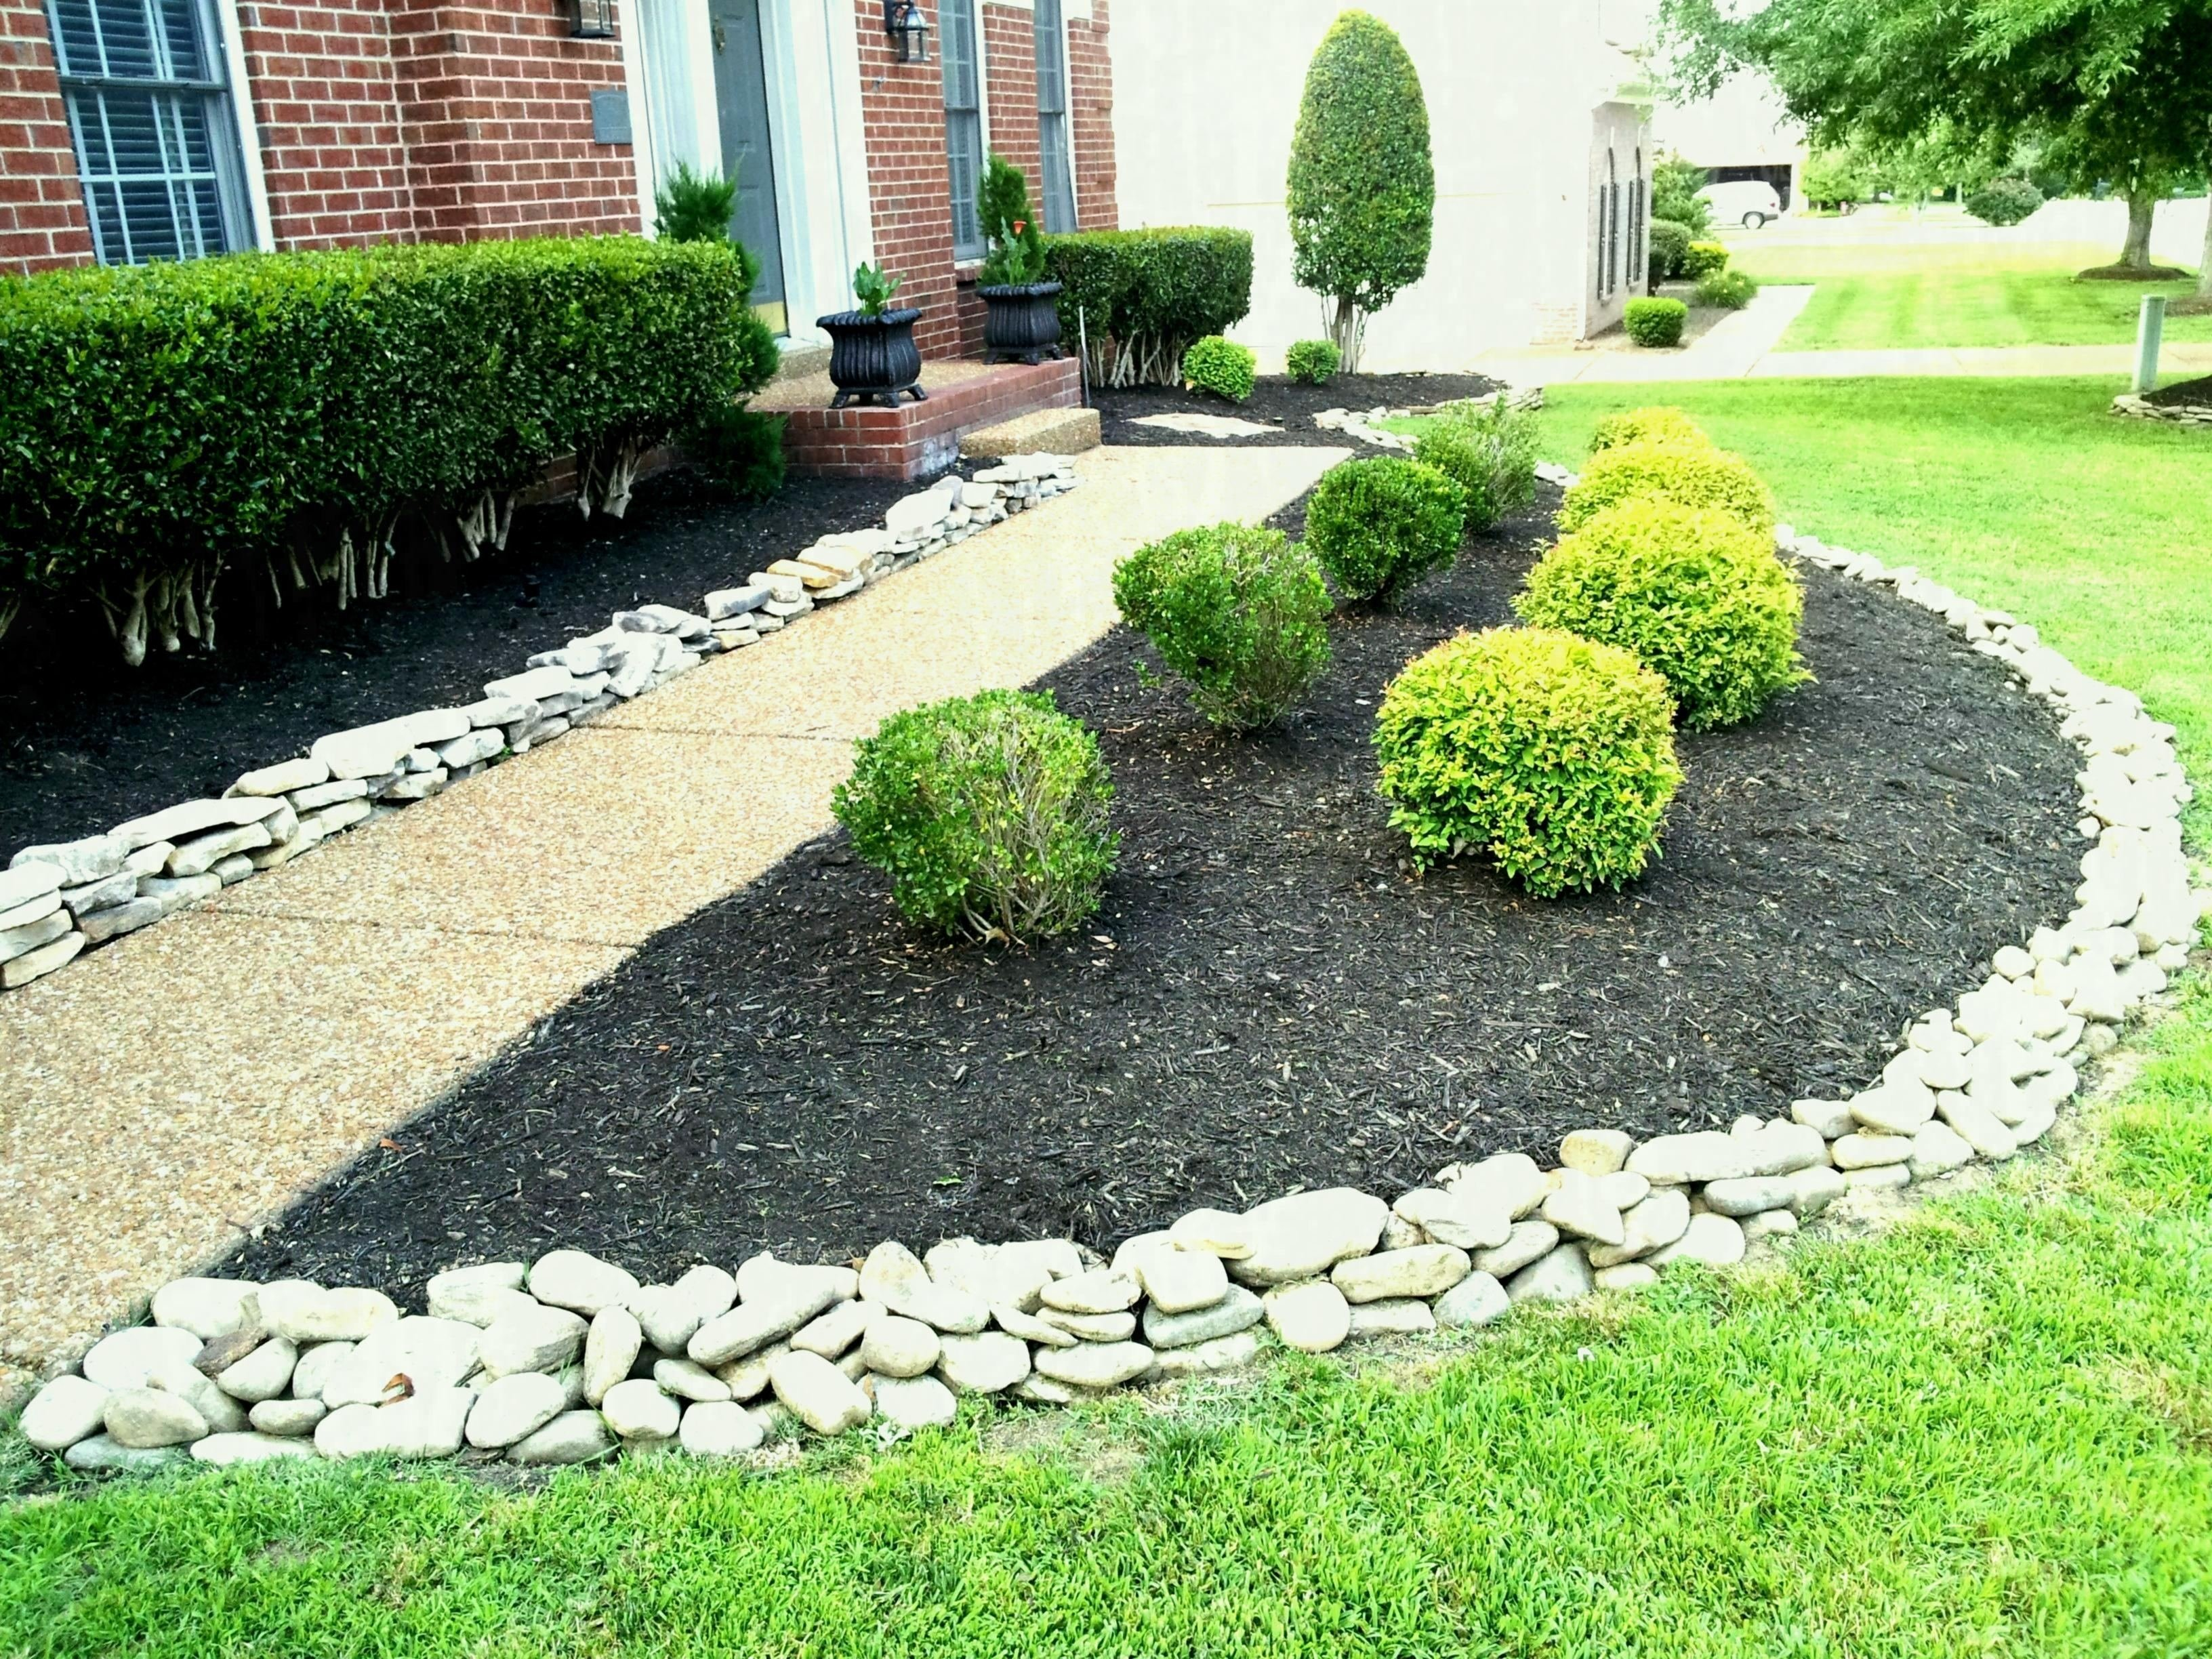 garden ideas using rocks - stunning using stones in your garden